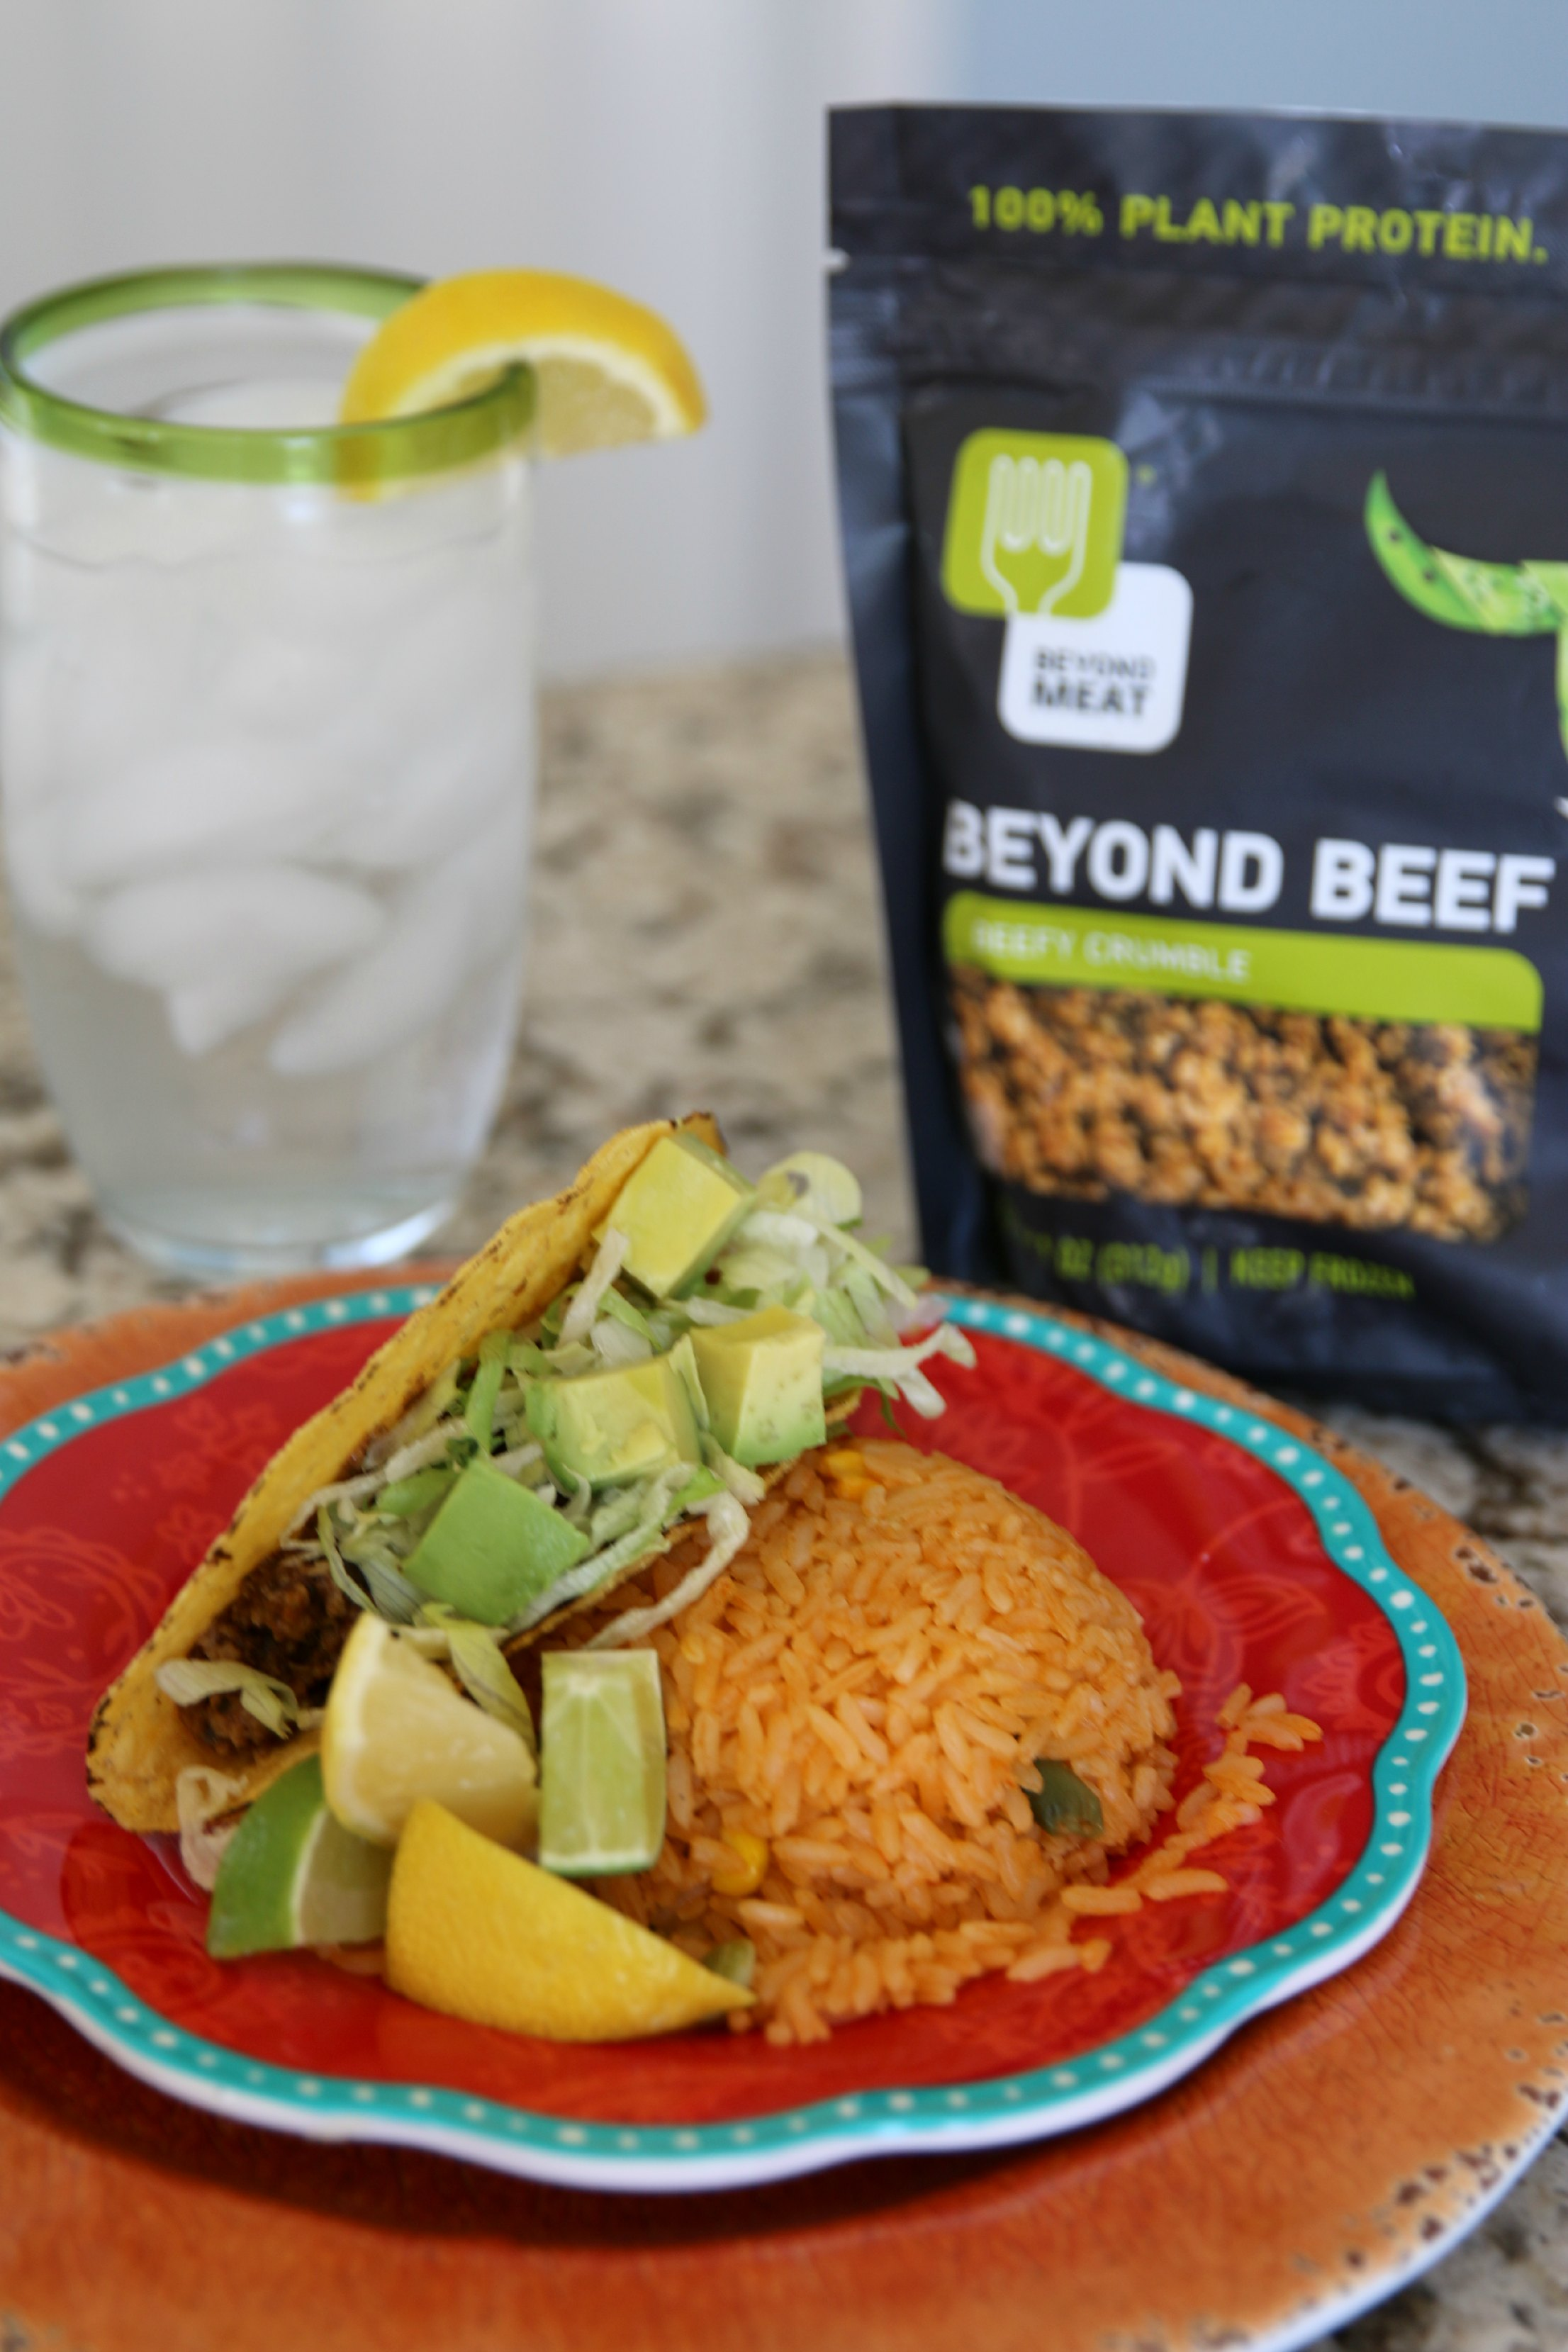 beyond meat taste test